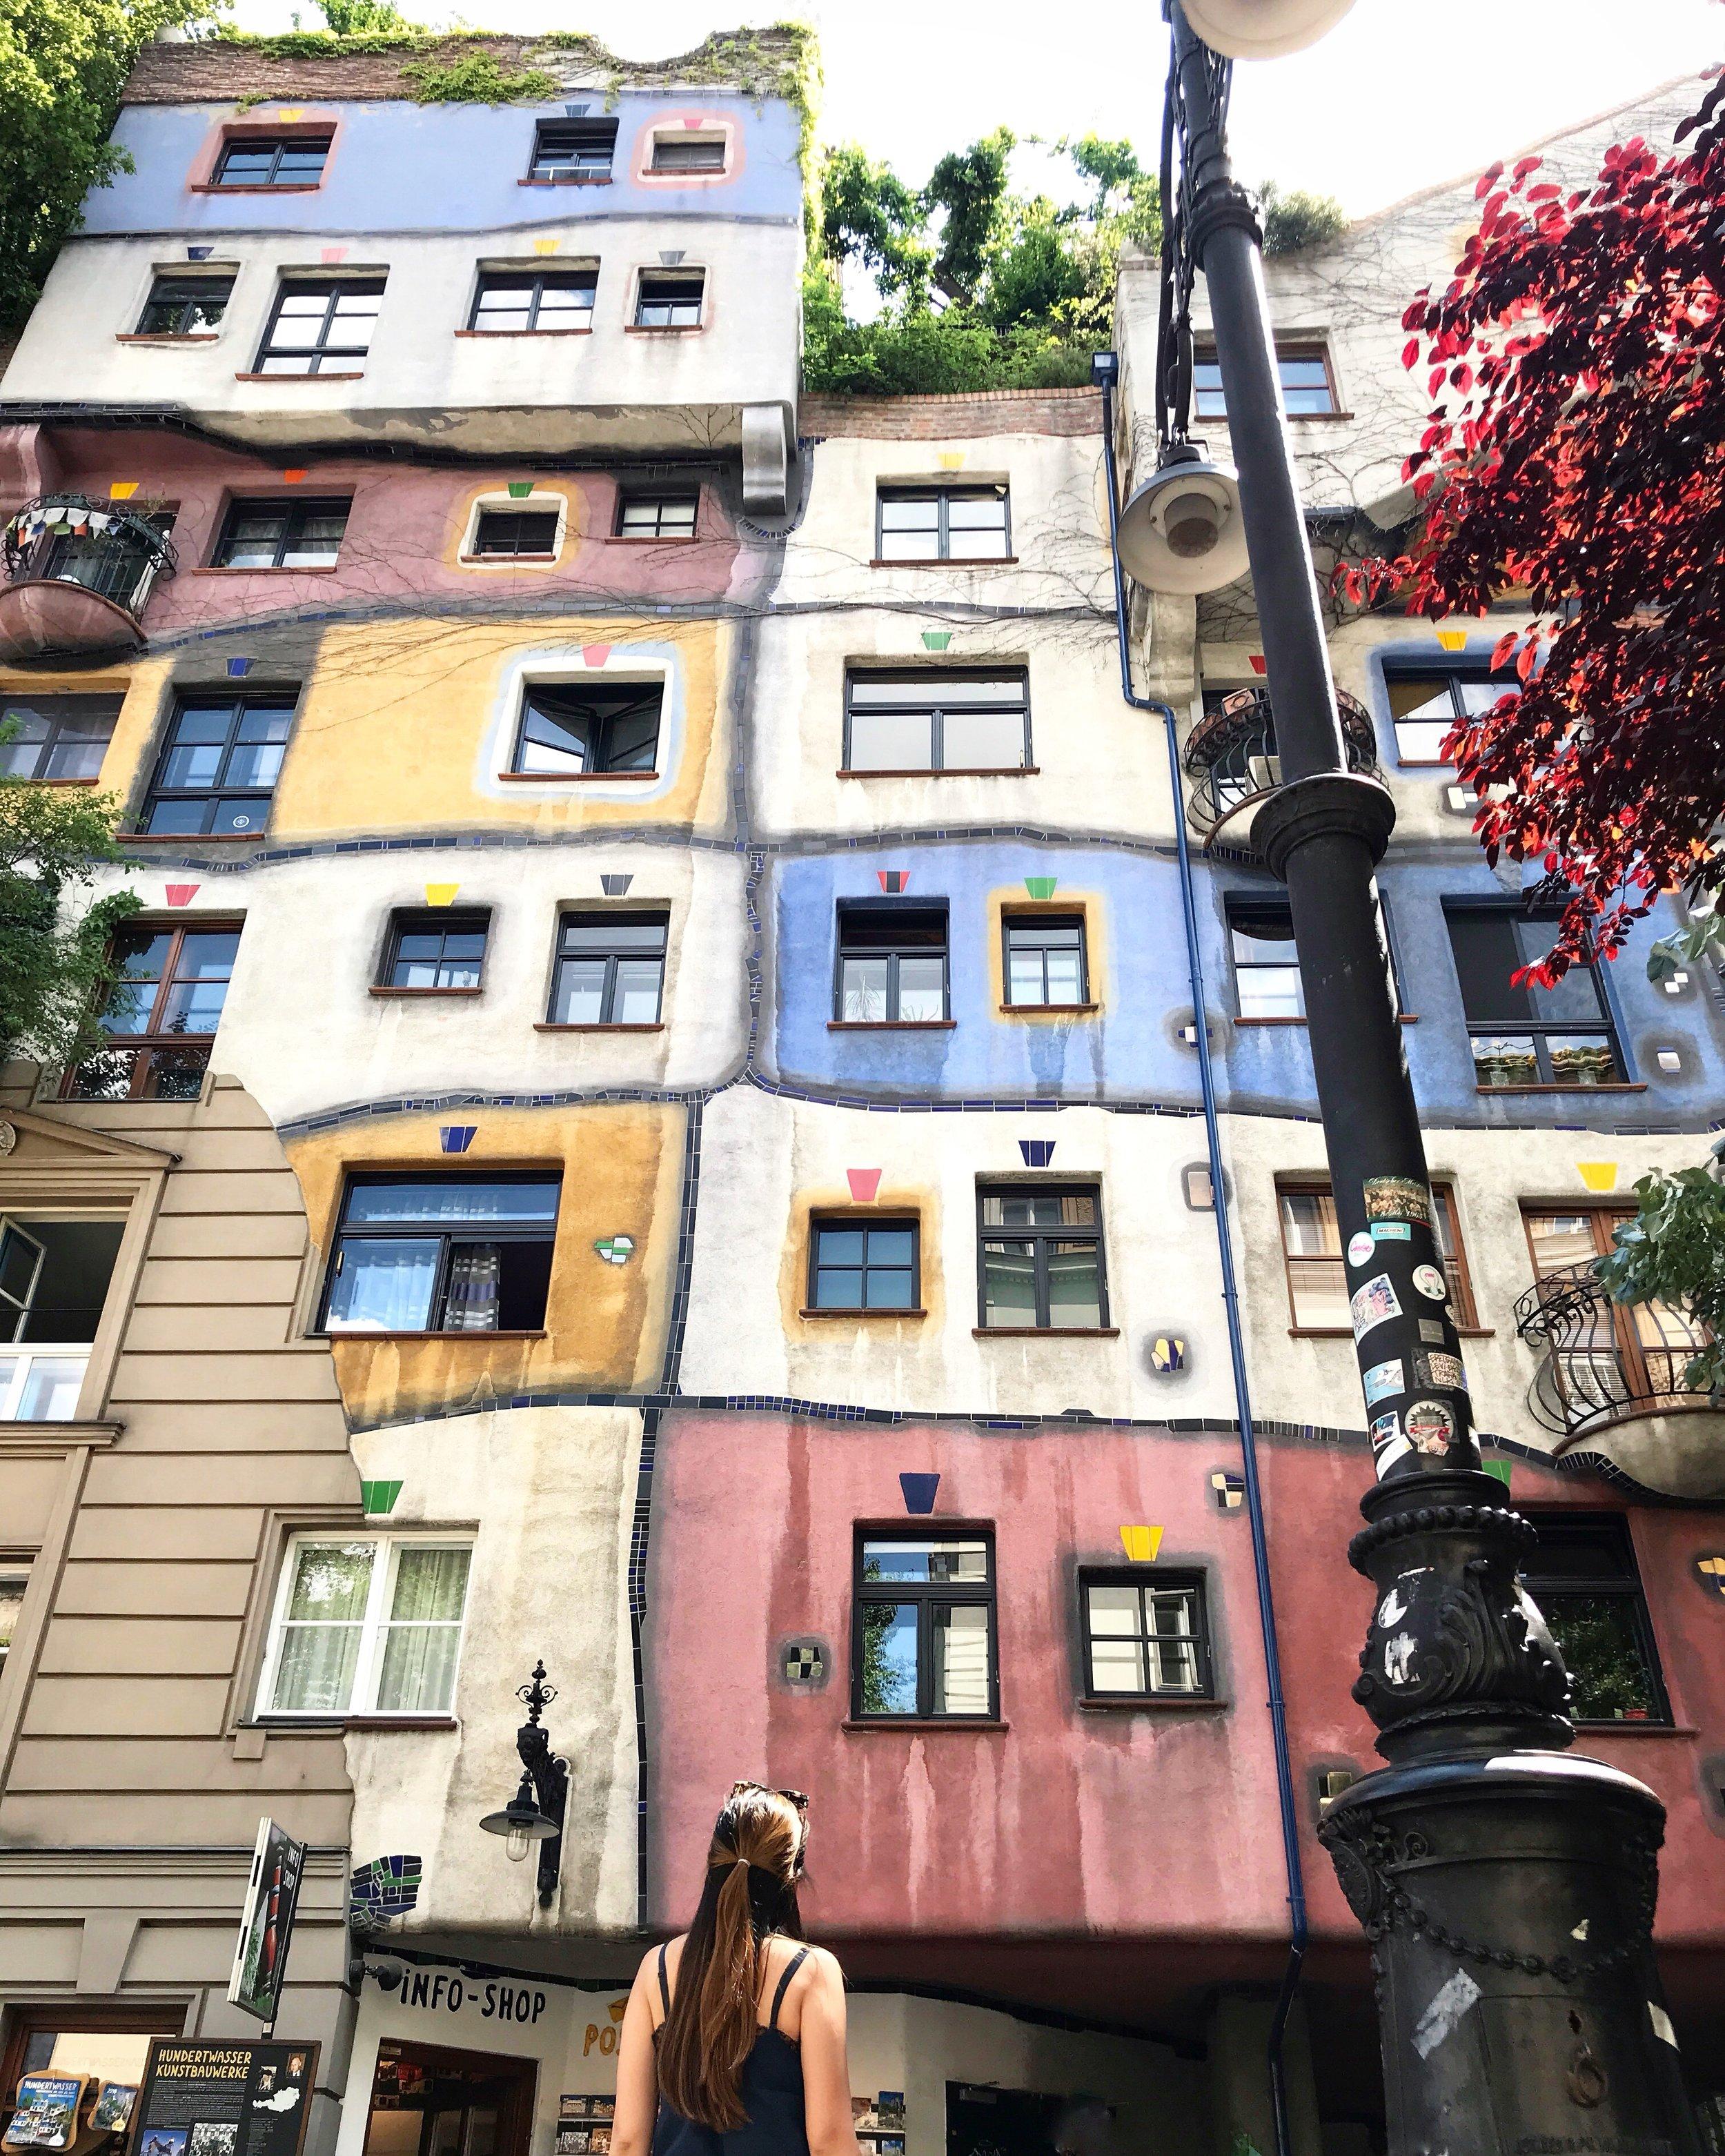 Checking out the Hundertwasserhaus located on Kegelgasse 36-38, 1030 Wien, Austria